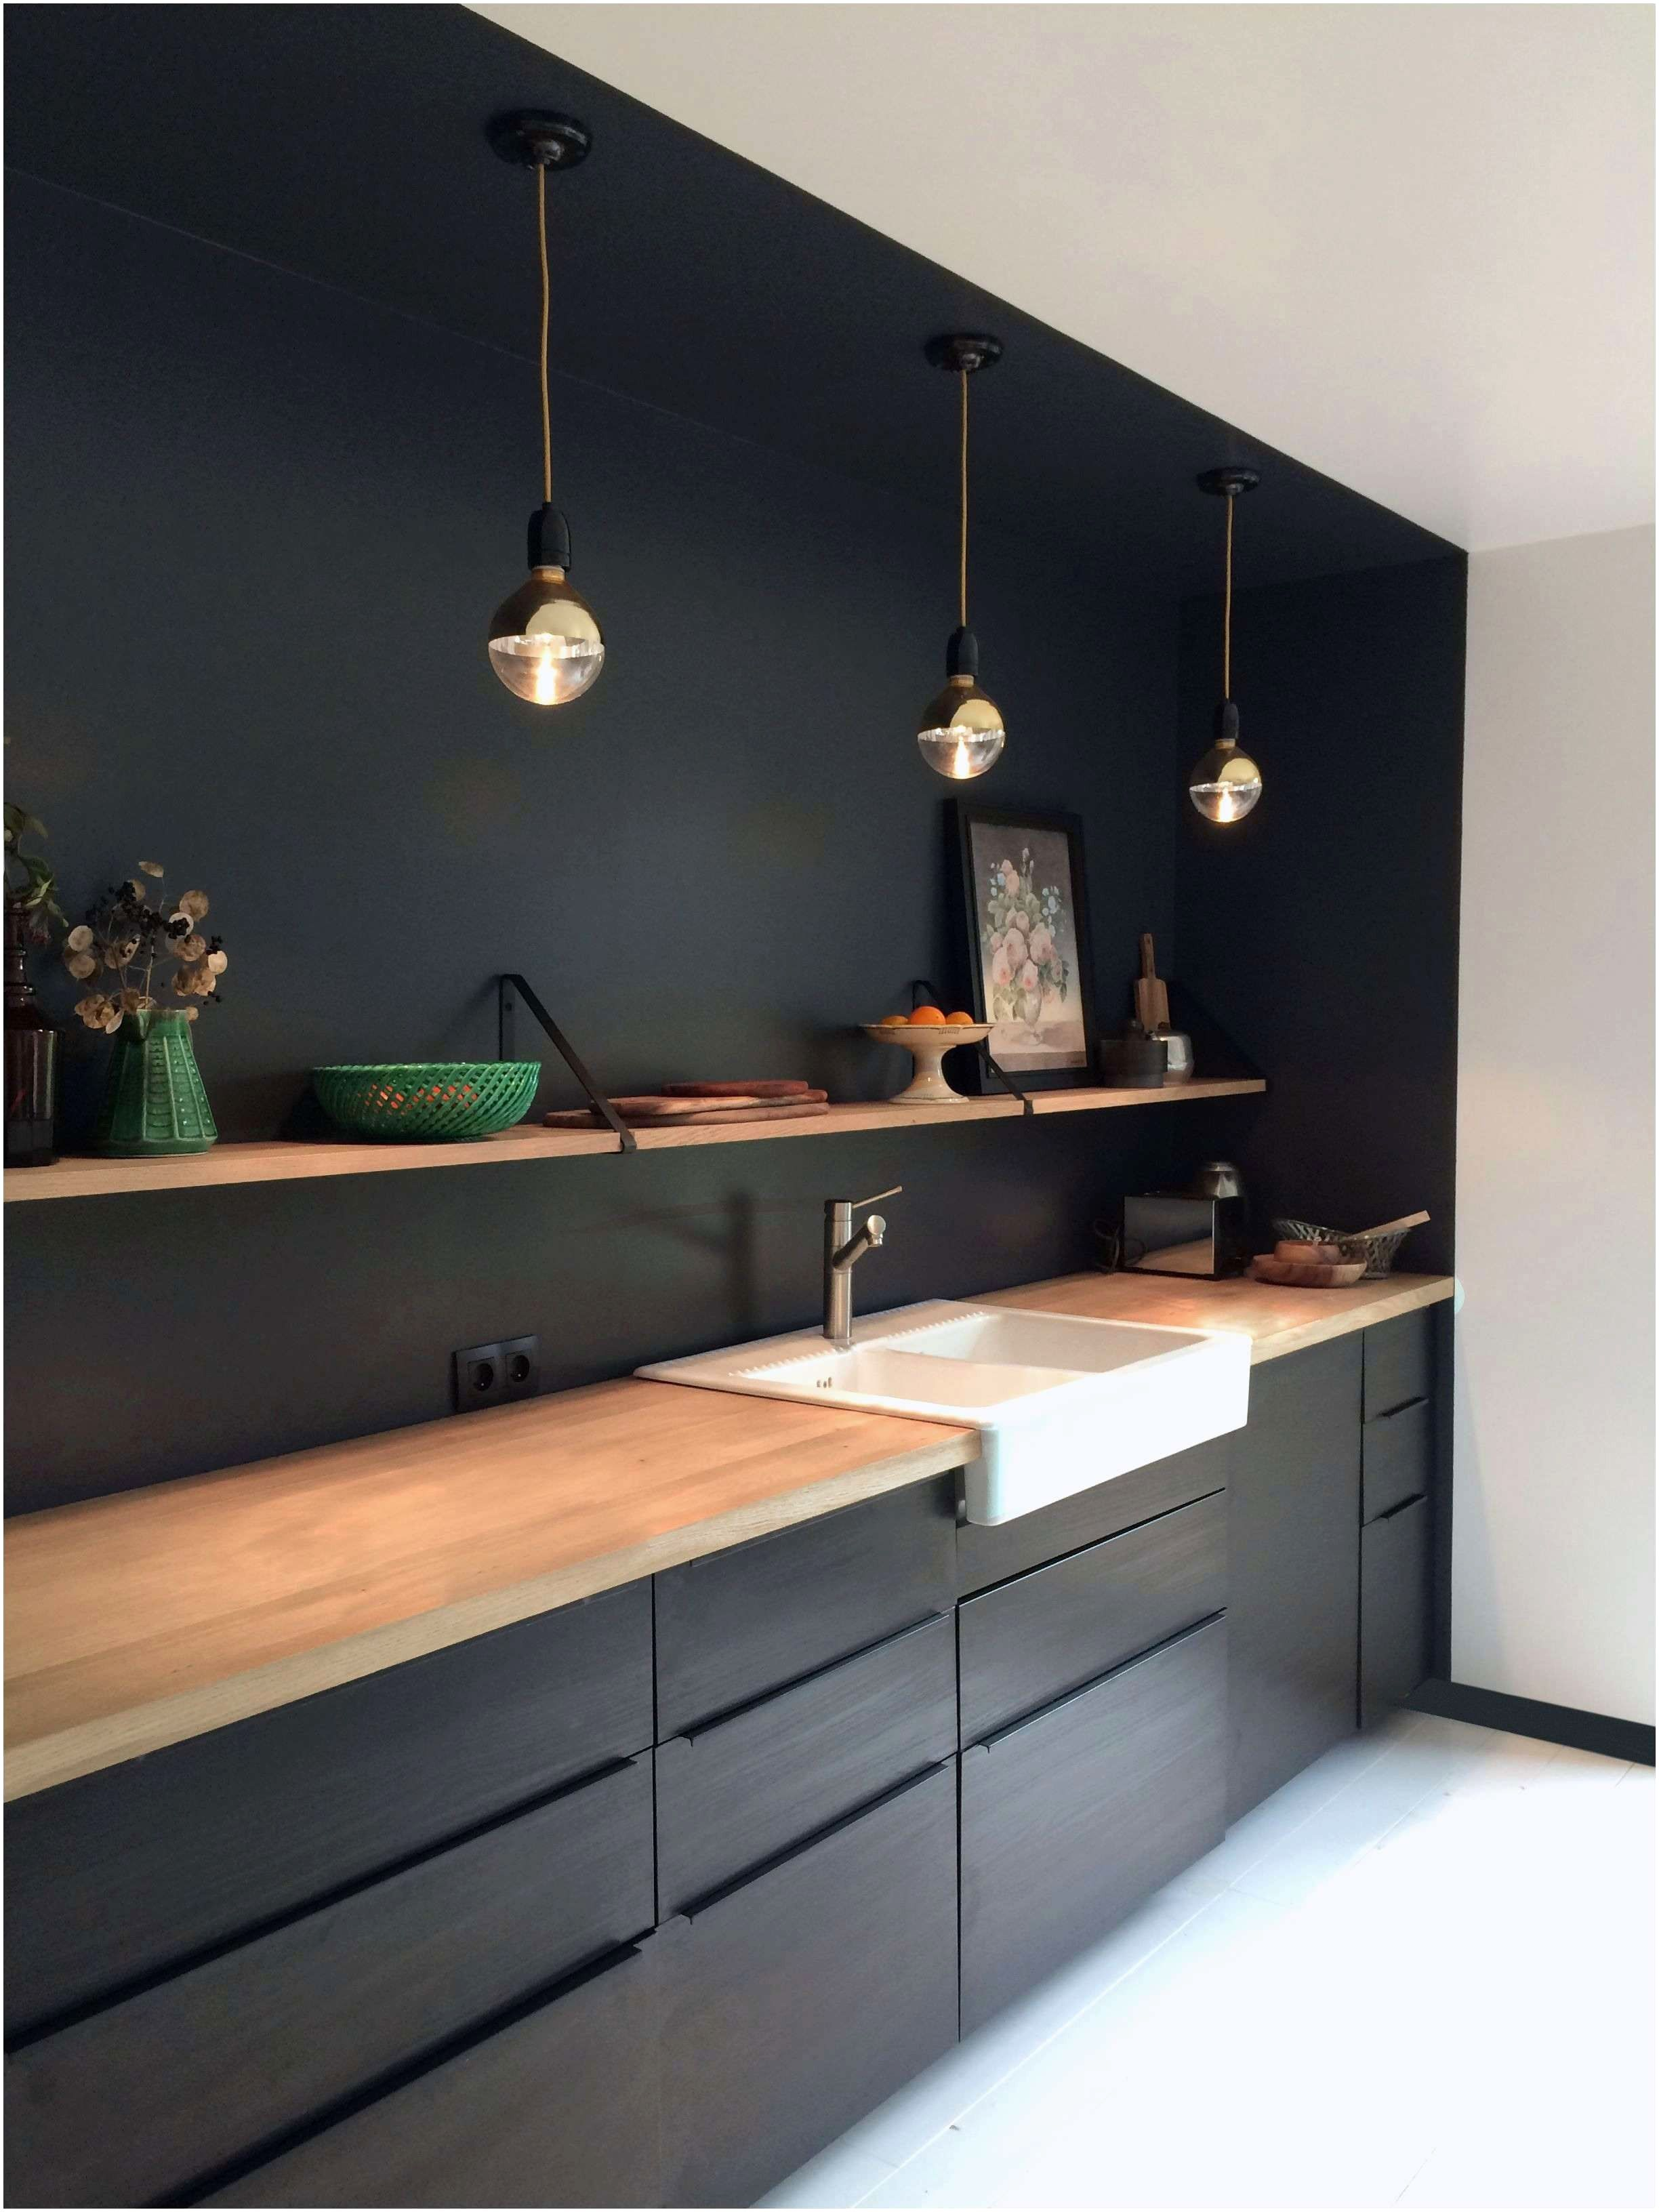 Rangement Sous Evier Ikea Gallery En 2020 Meuble Cuisine Decoration De Cuisine Rangement Sous Evier Ikea